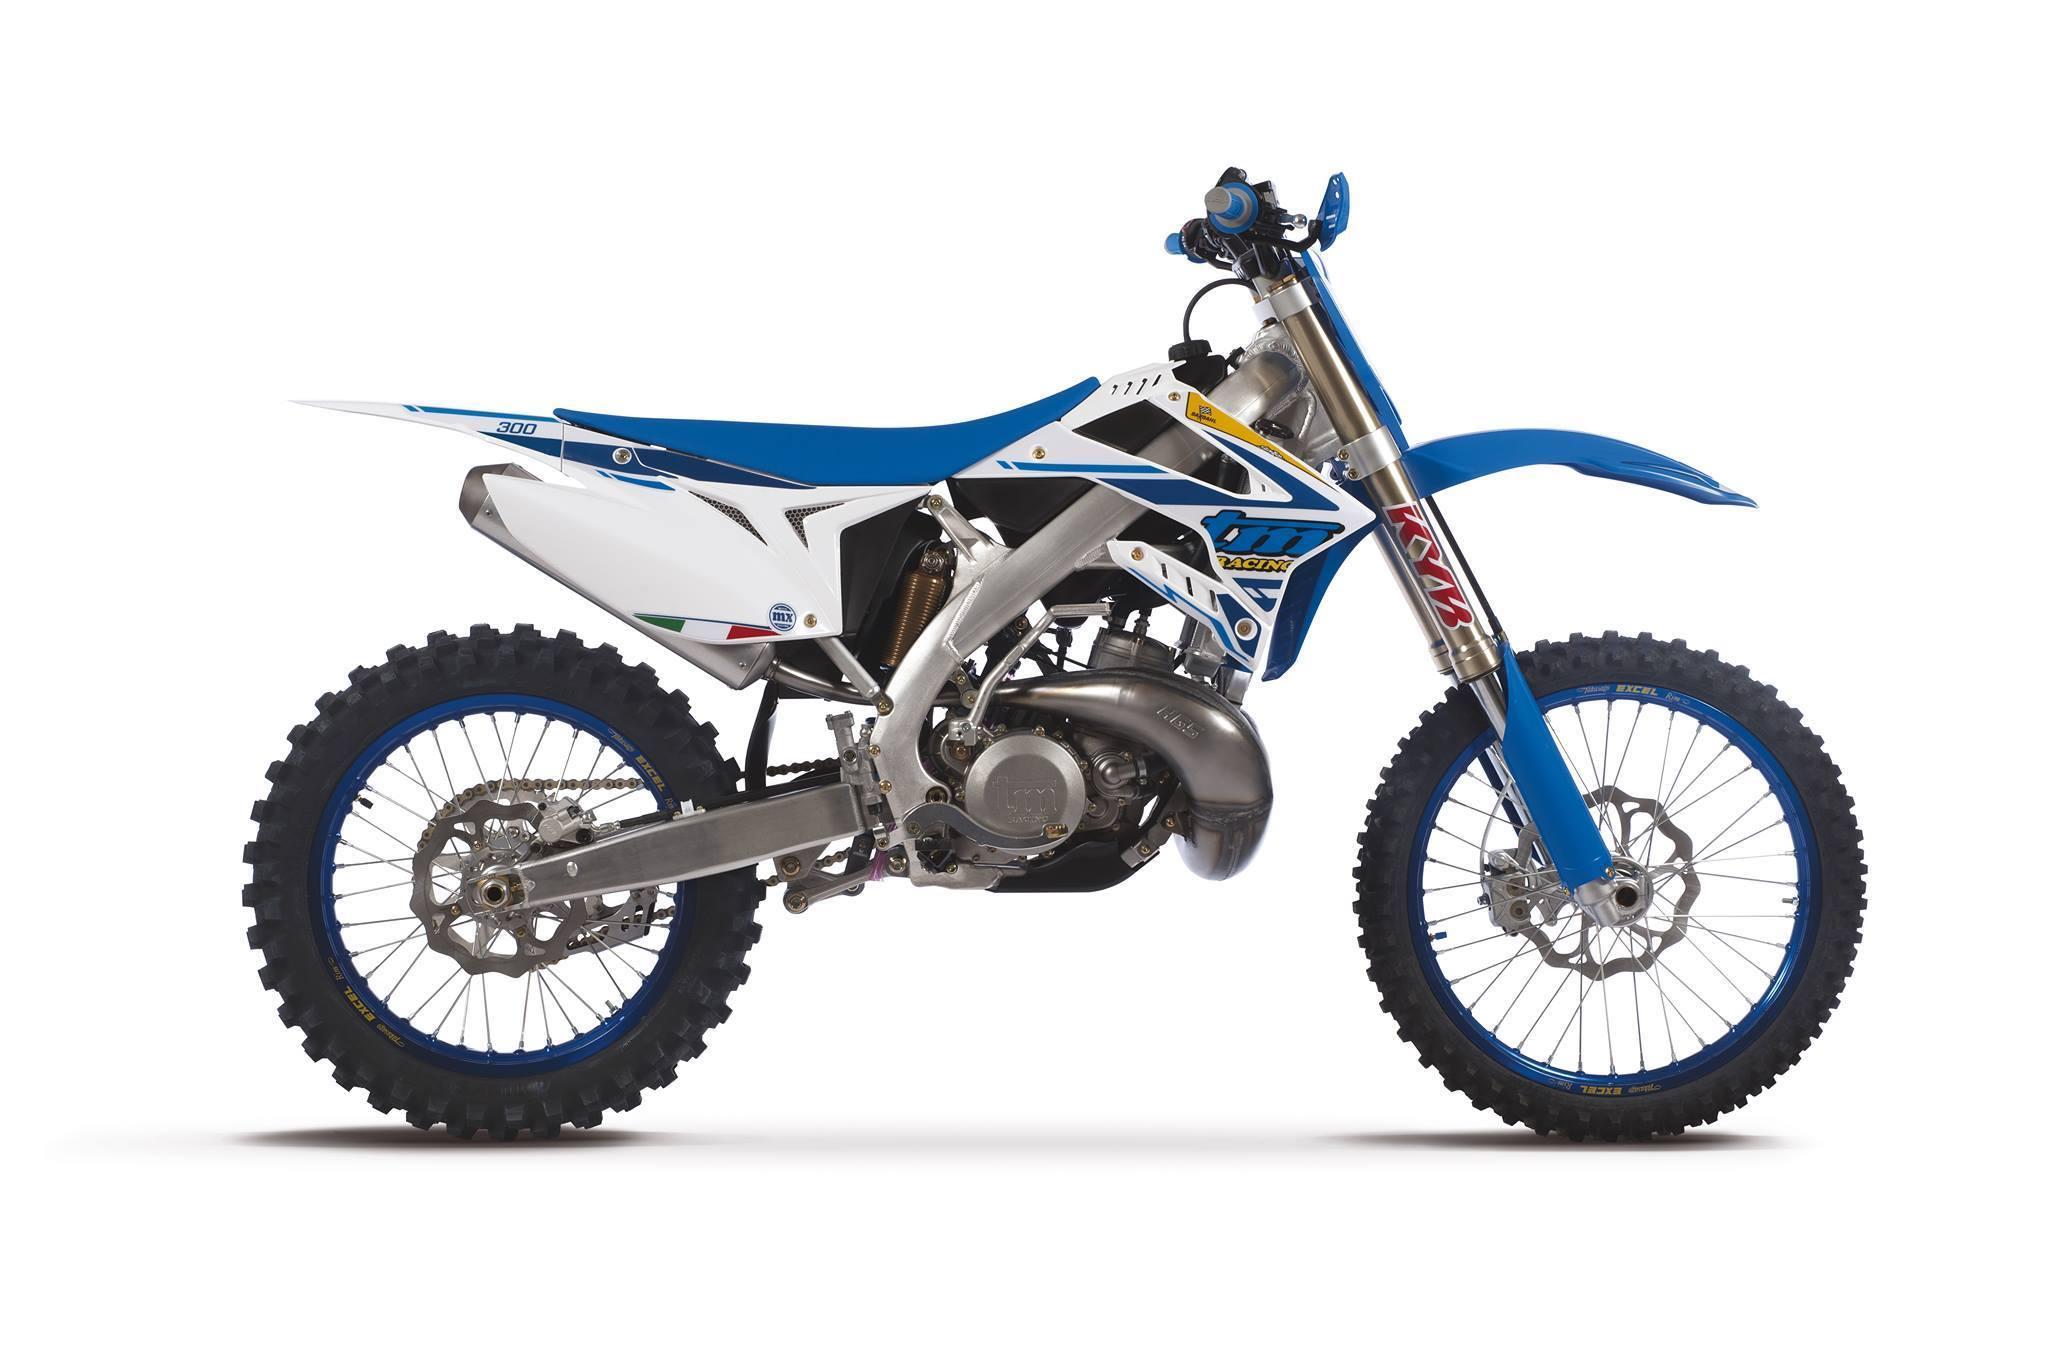 Emu Racing Motocross And Enduro Dirt Bikes Parts Australia